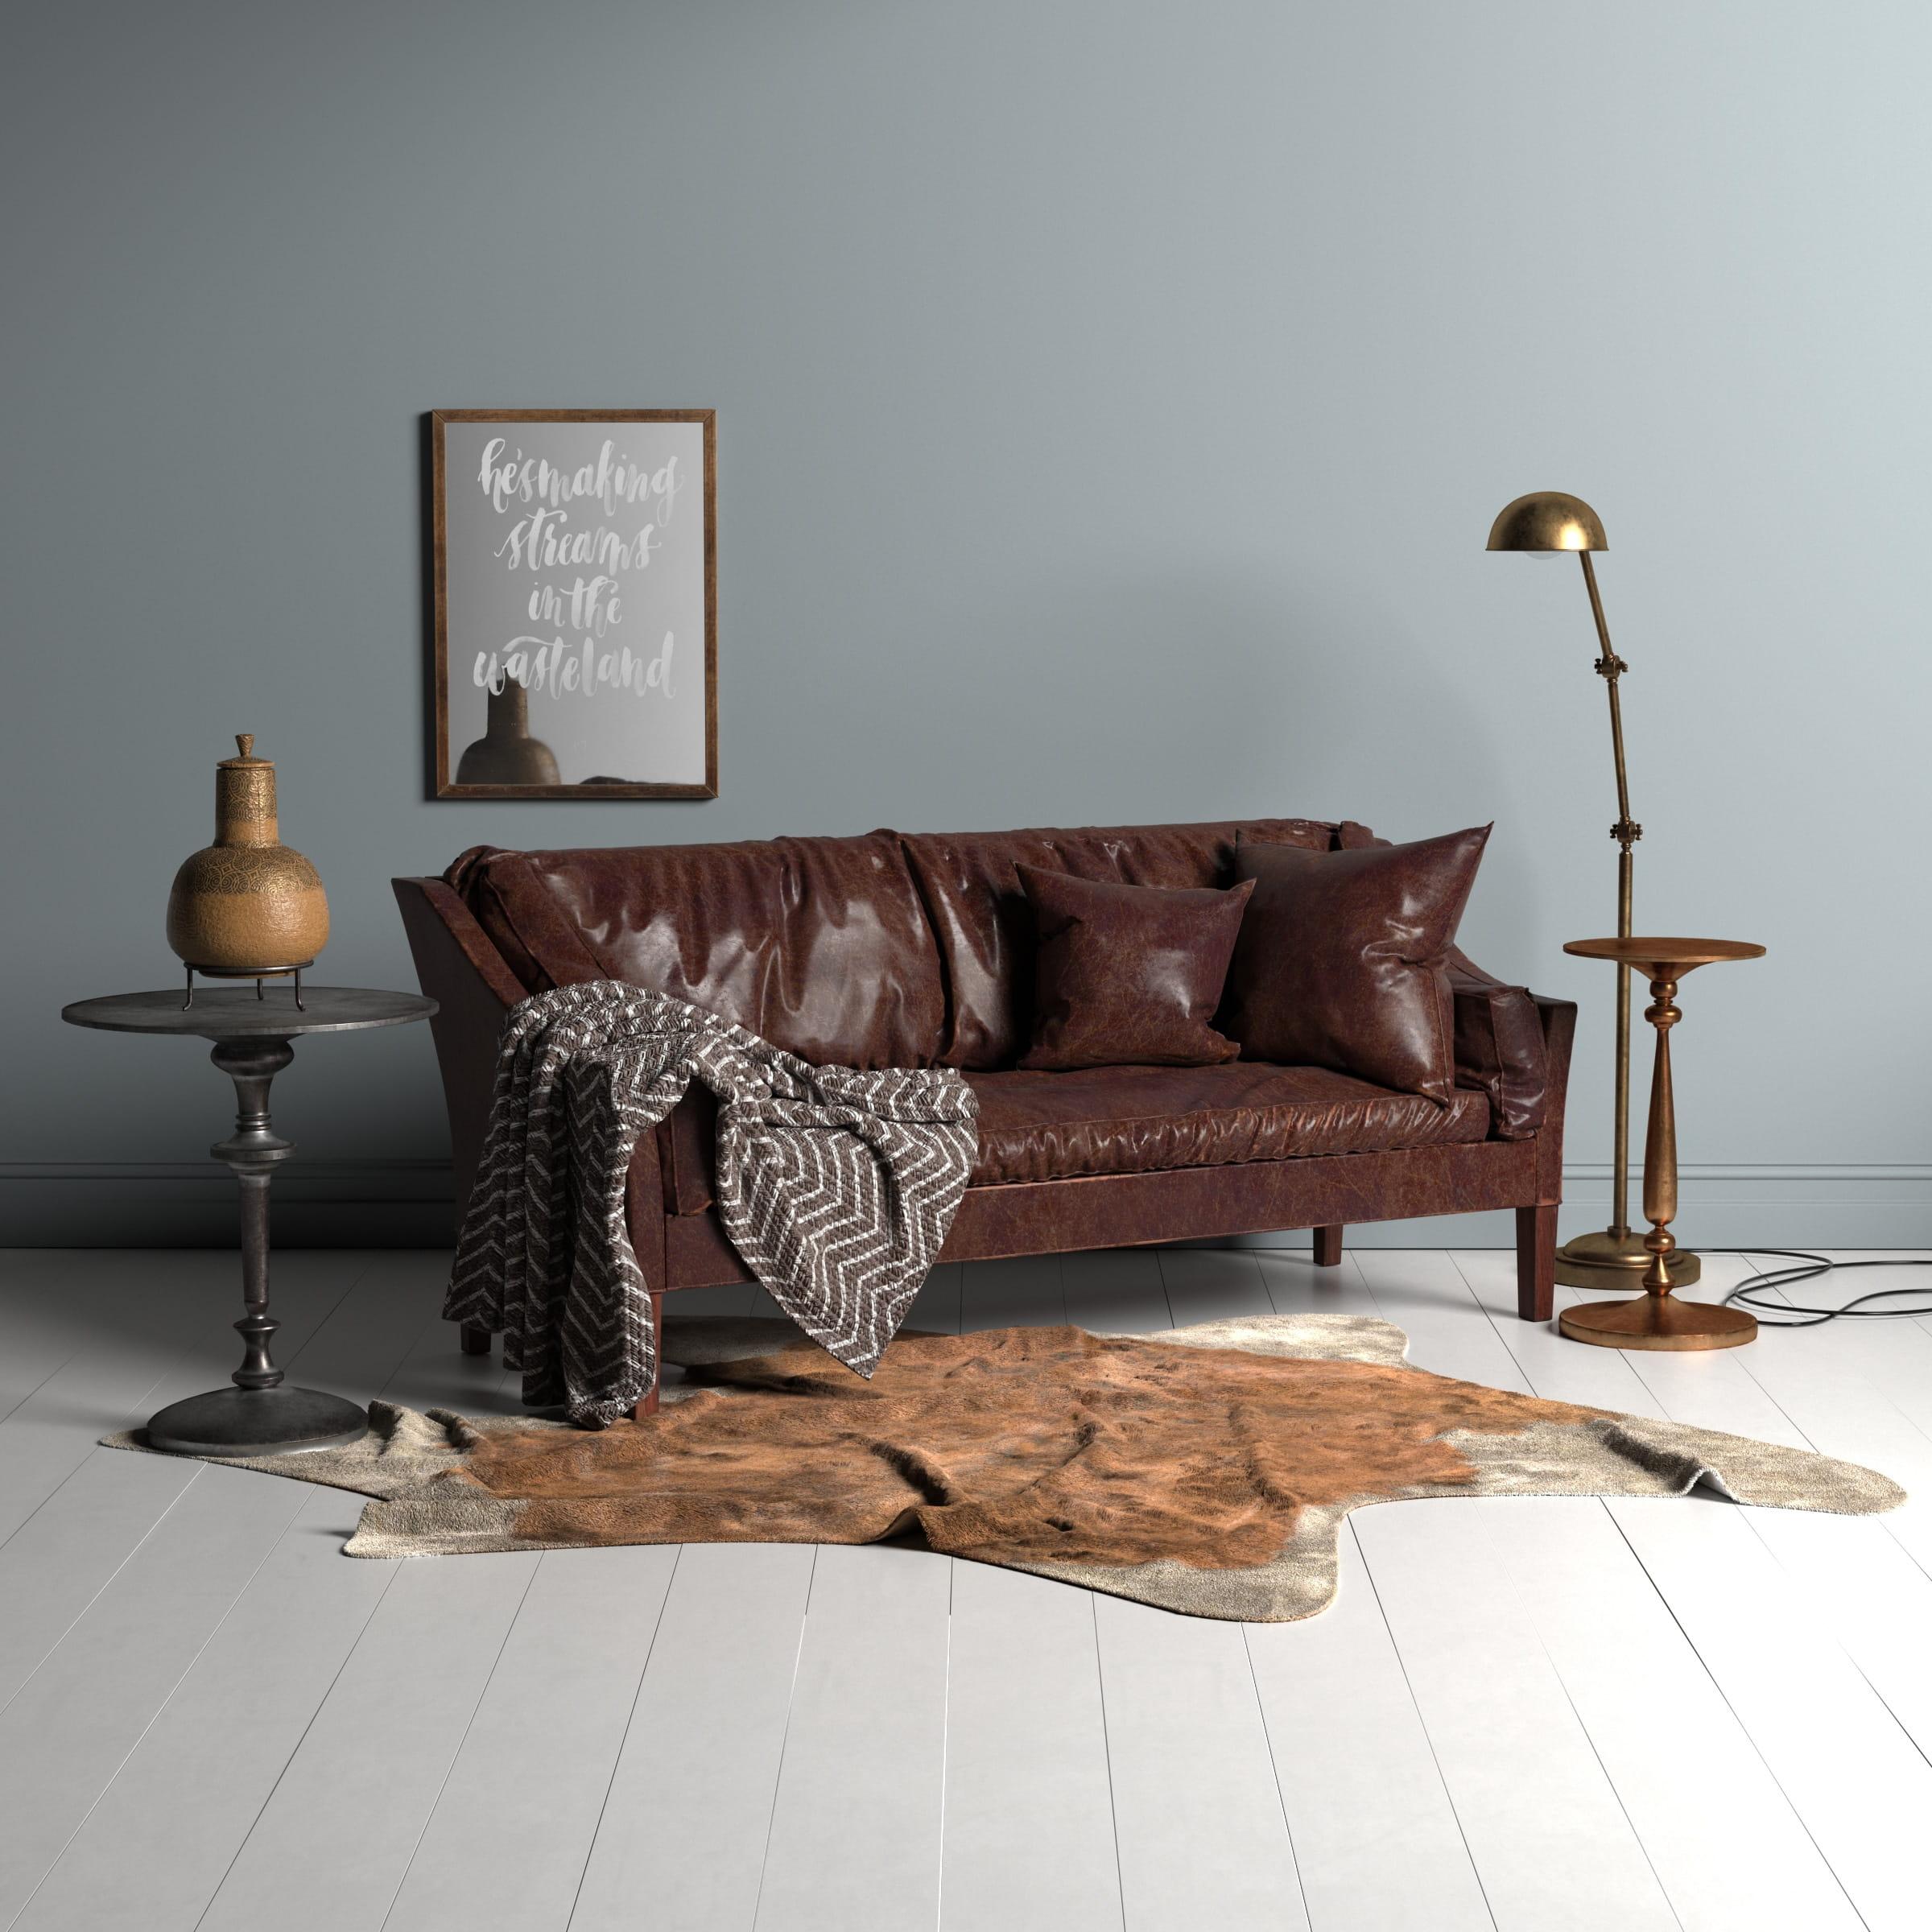 furniture set 3 AM225